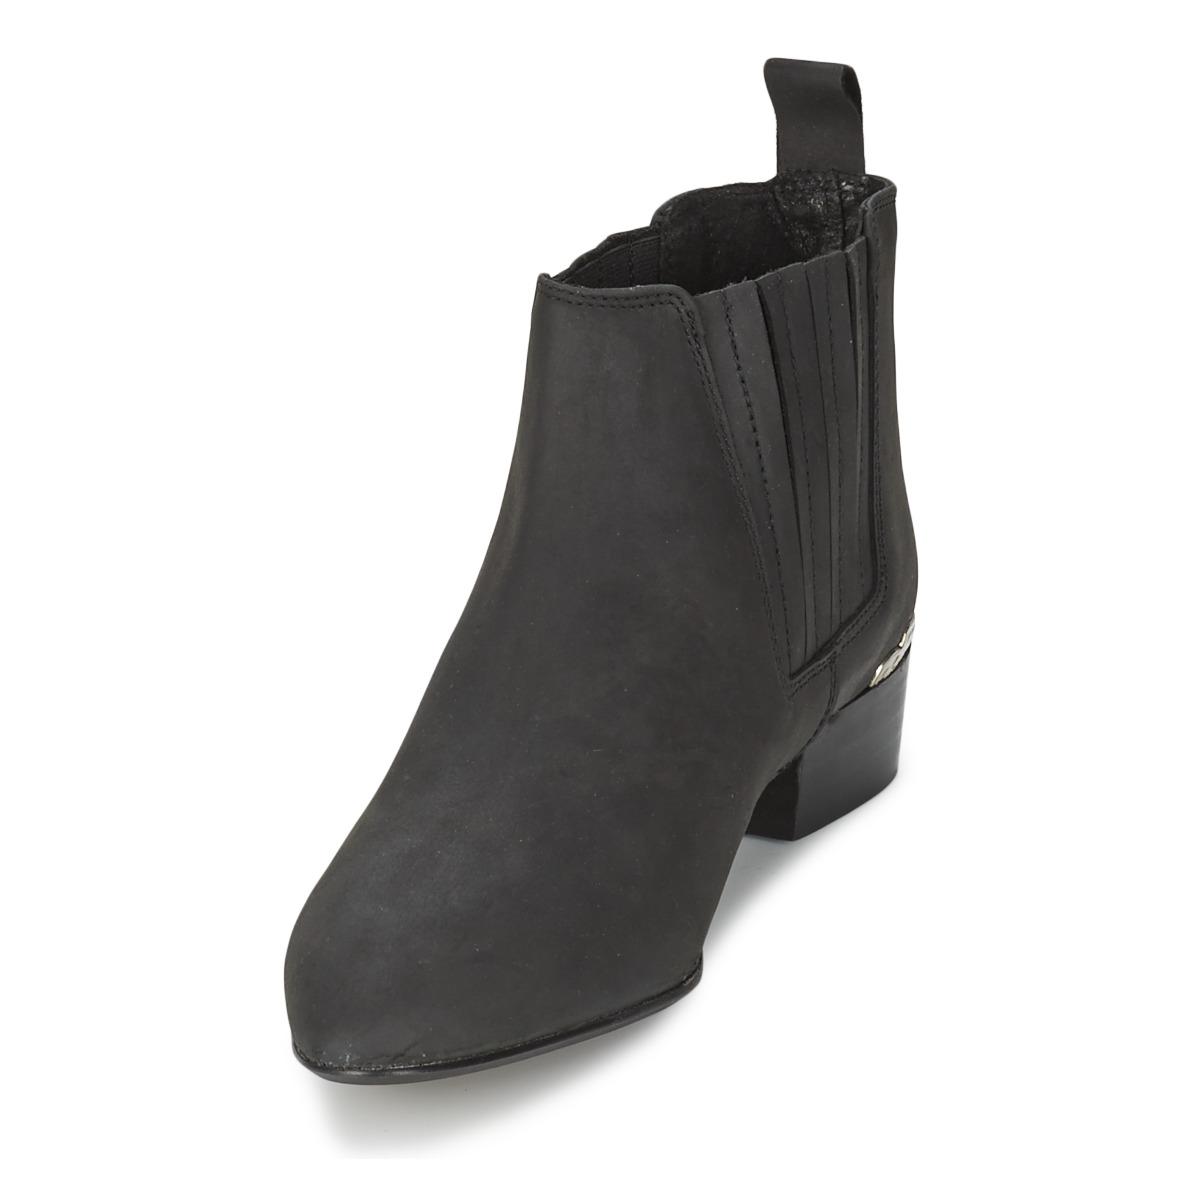 Kg By Kurt Geiger Slade Noir - Livraison Gratuite Chaussures Boot Femme 122,50 €